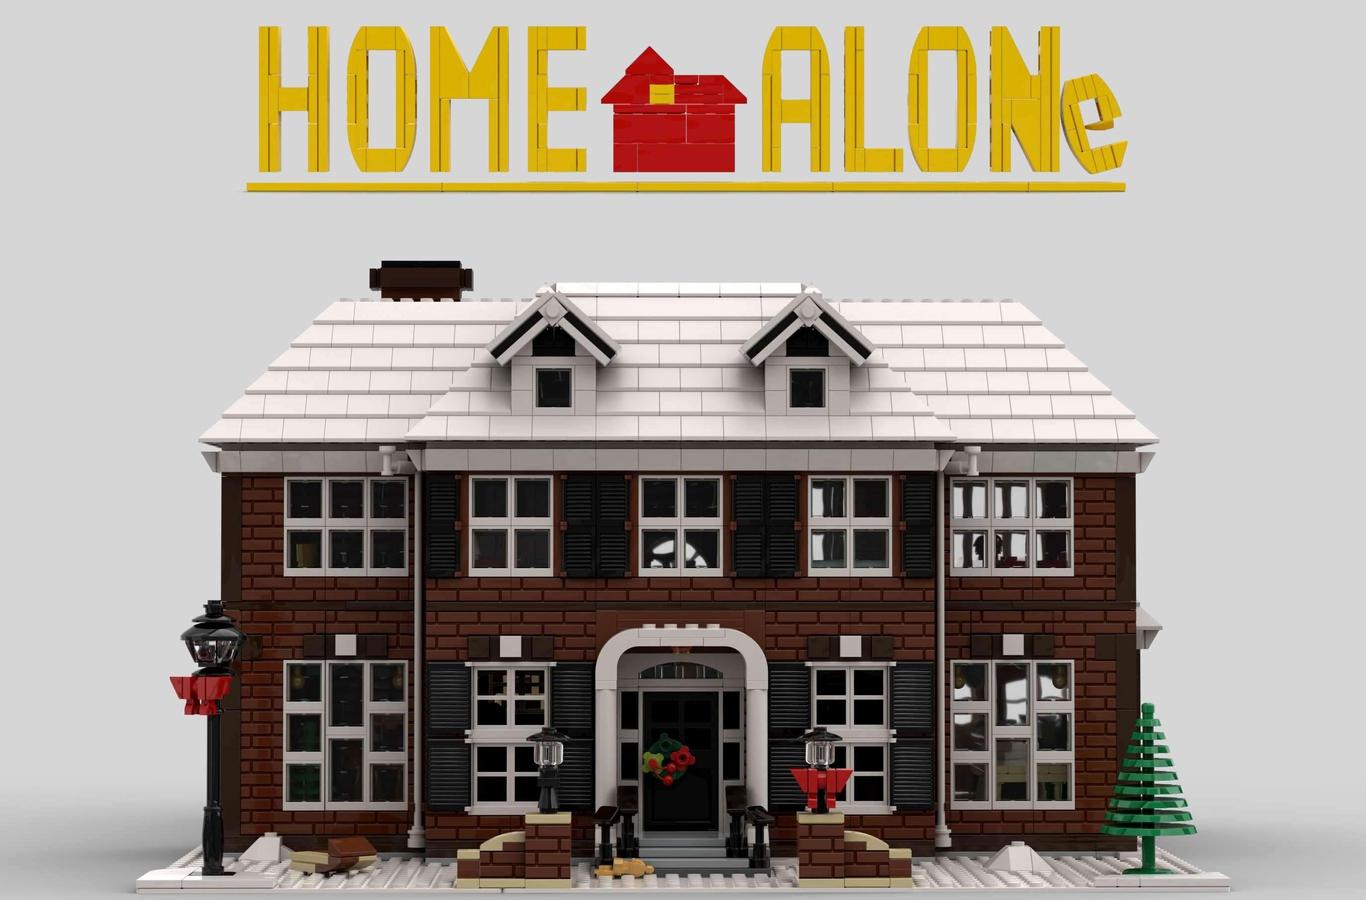 lego-ideas-home-alone-adwind zusammengebaut.com